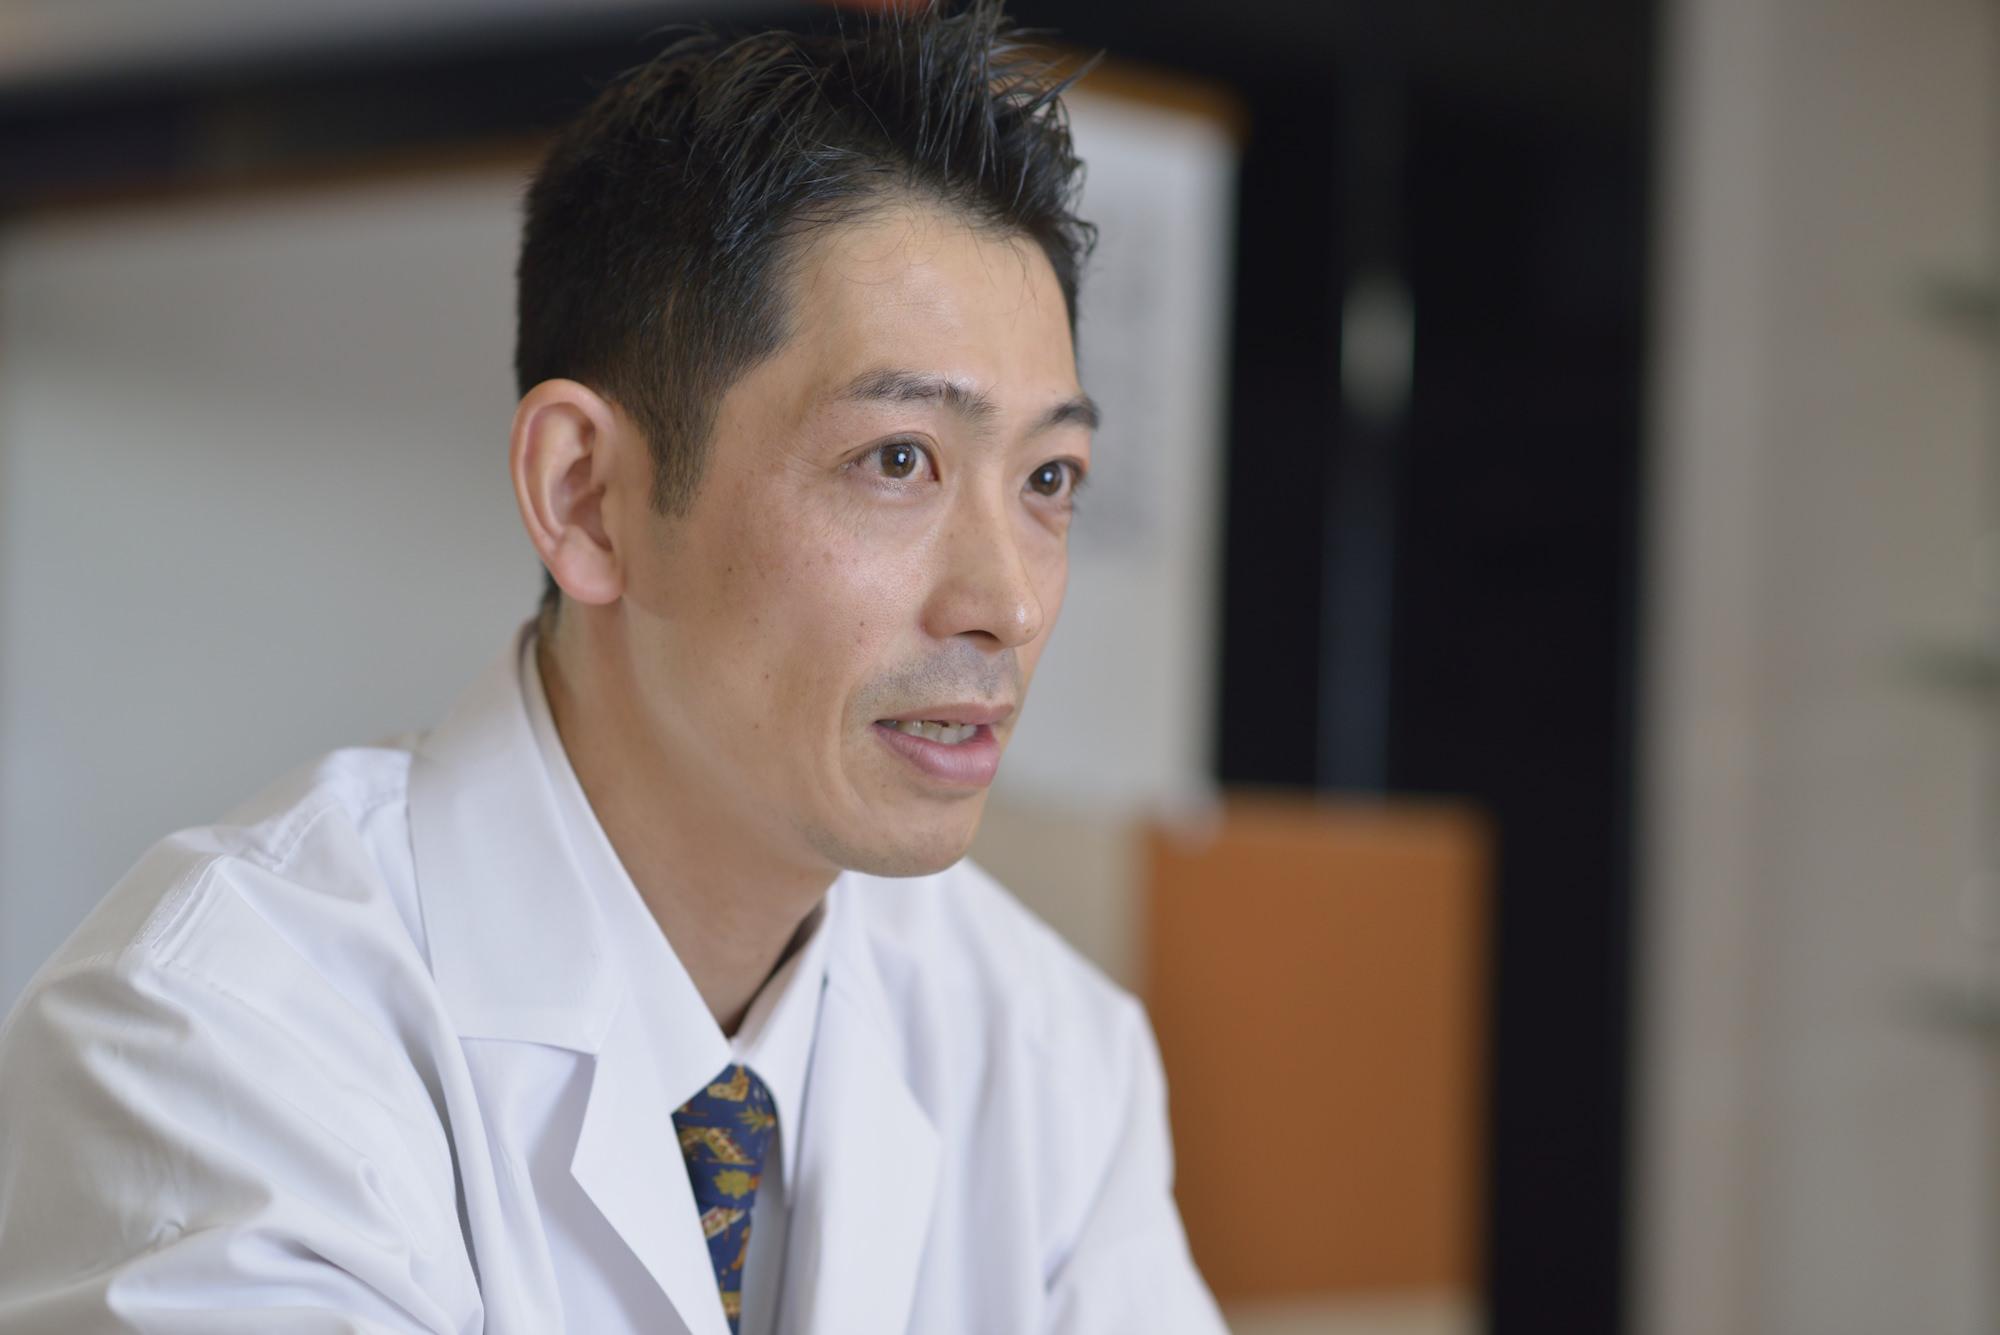 Man'u Bekkan Toshihiro Yoshida